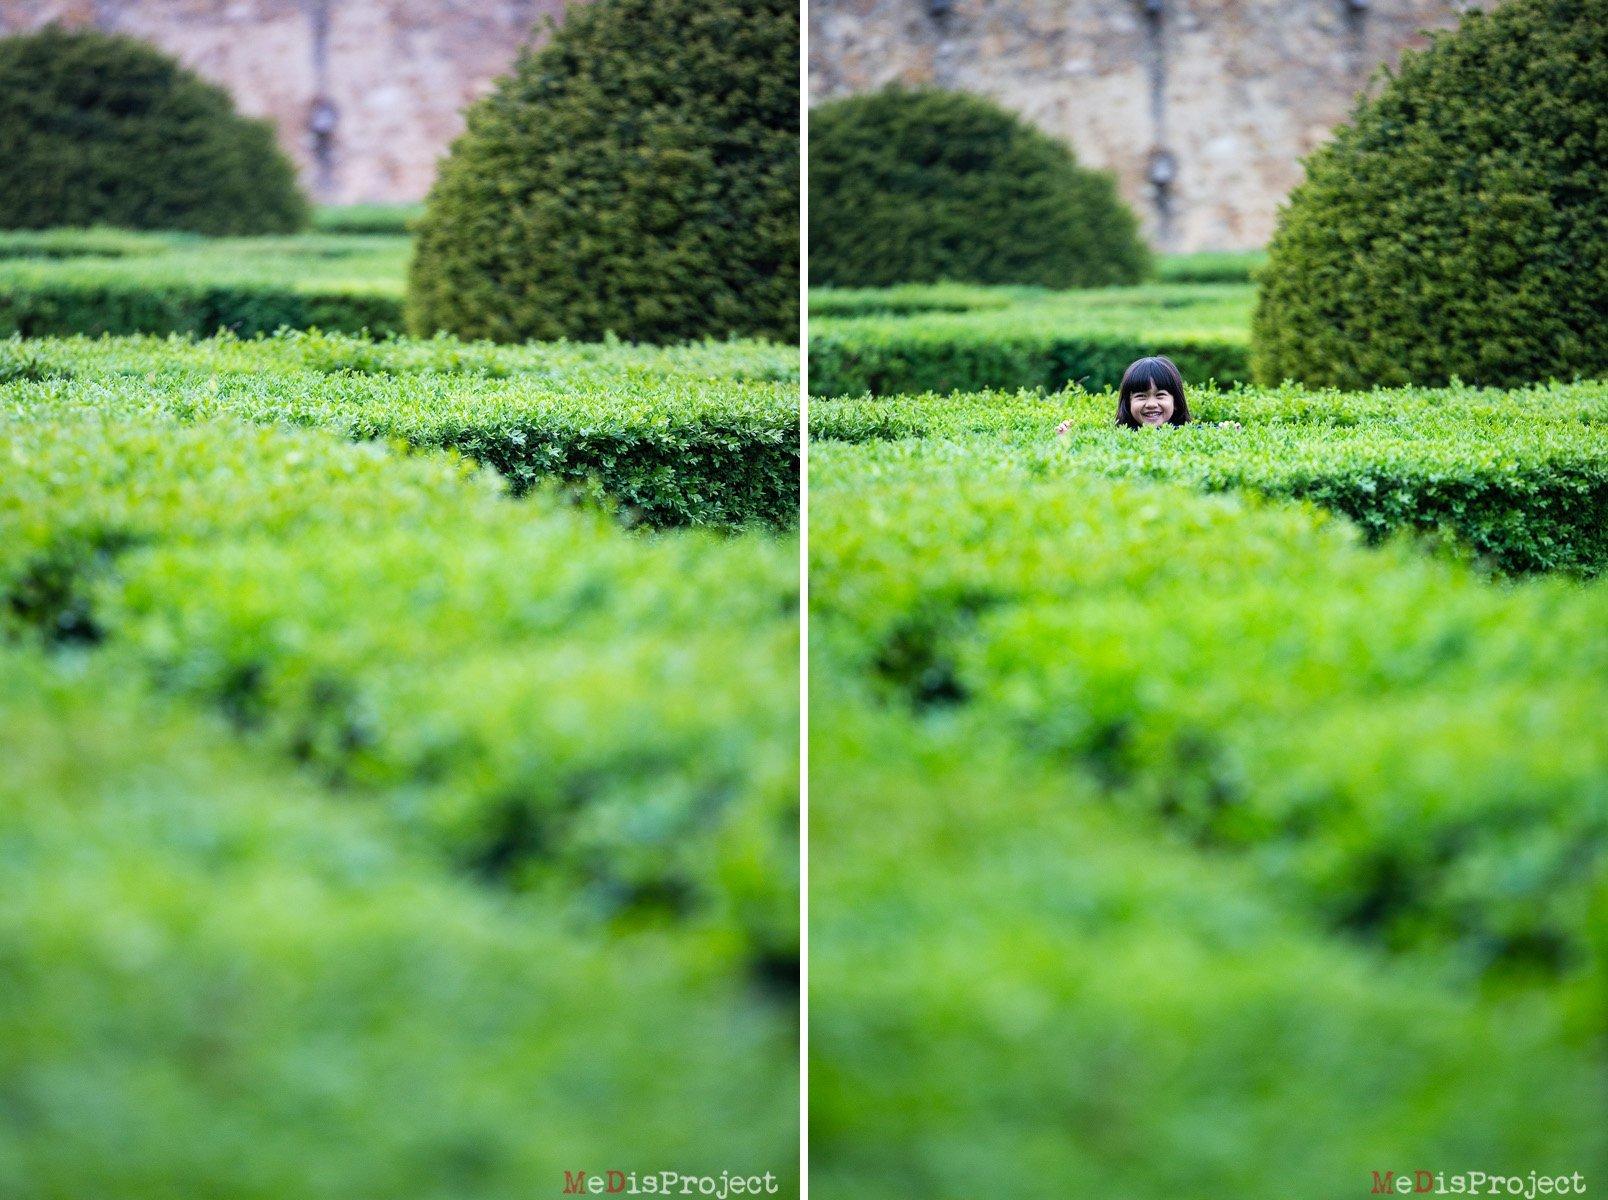 little girl playing peekaboo through the hedges